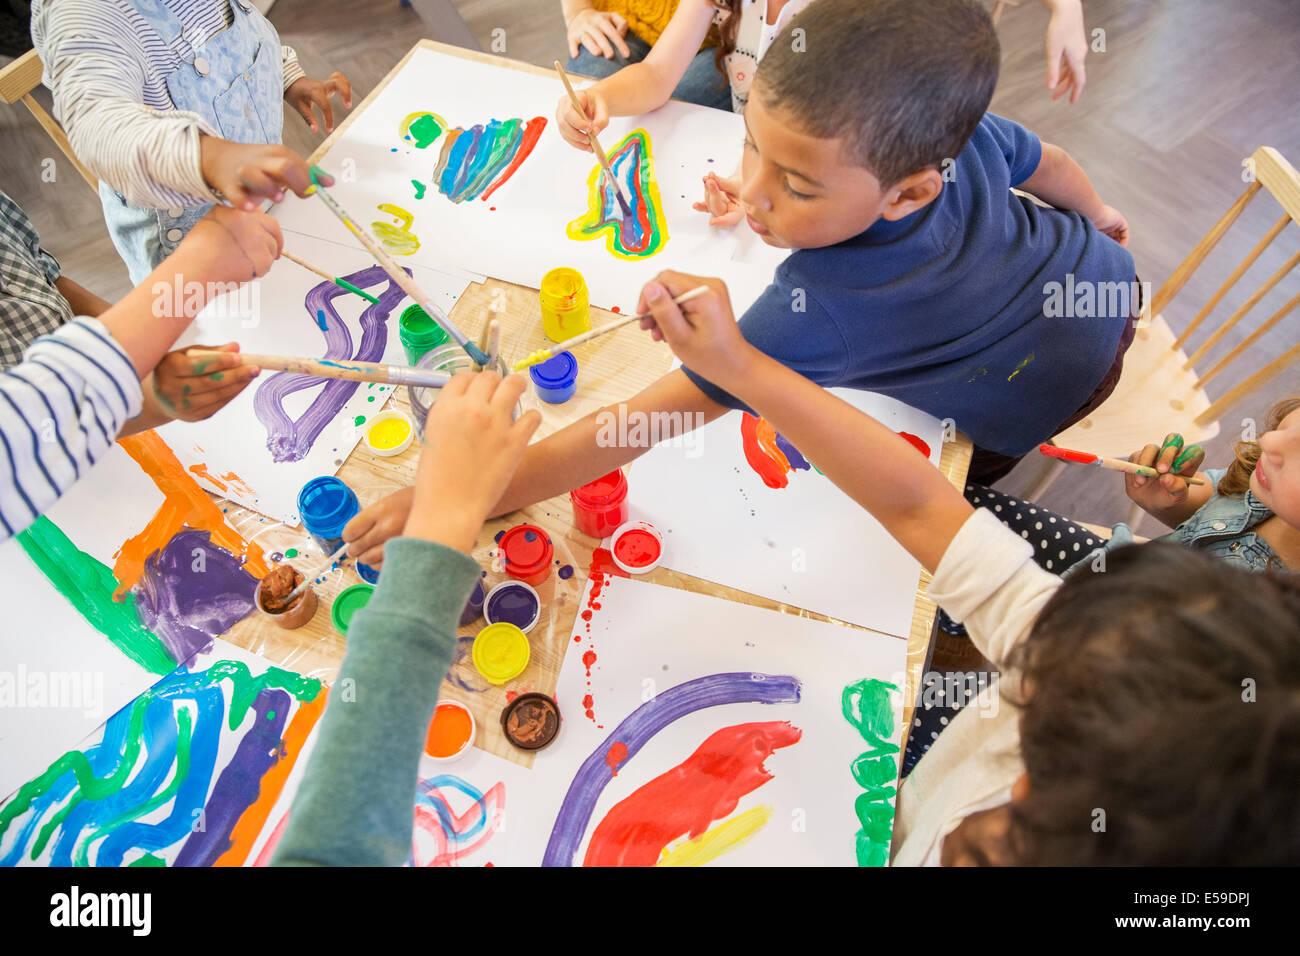 Pittura per bambini in classe Immagini Stock